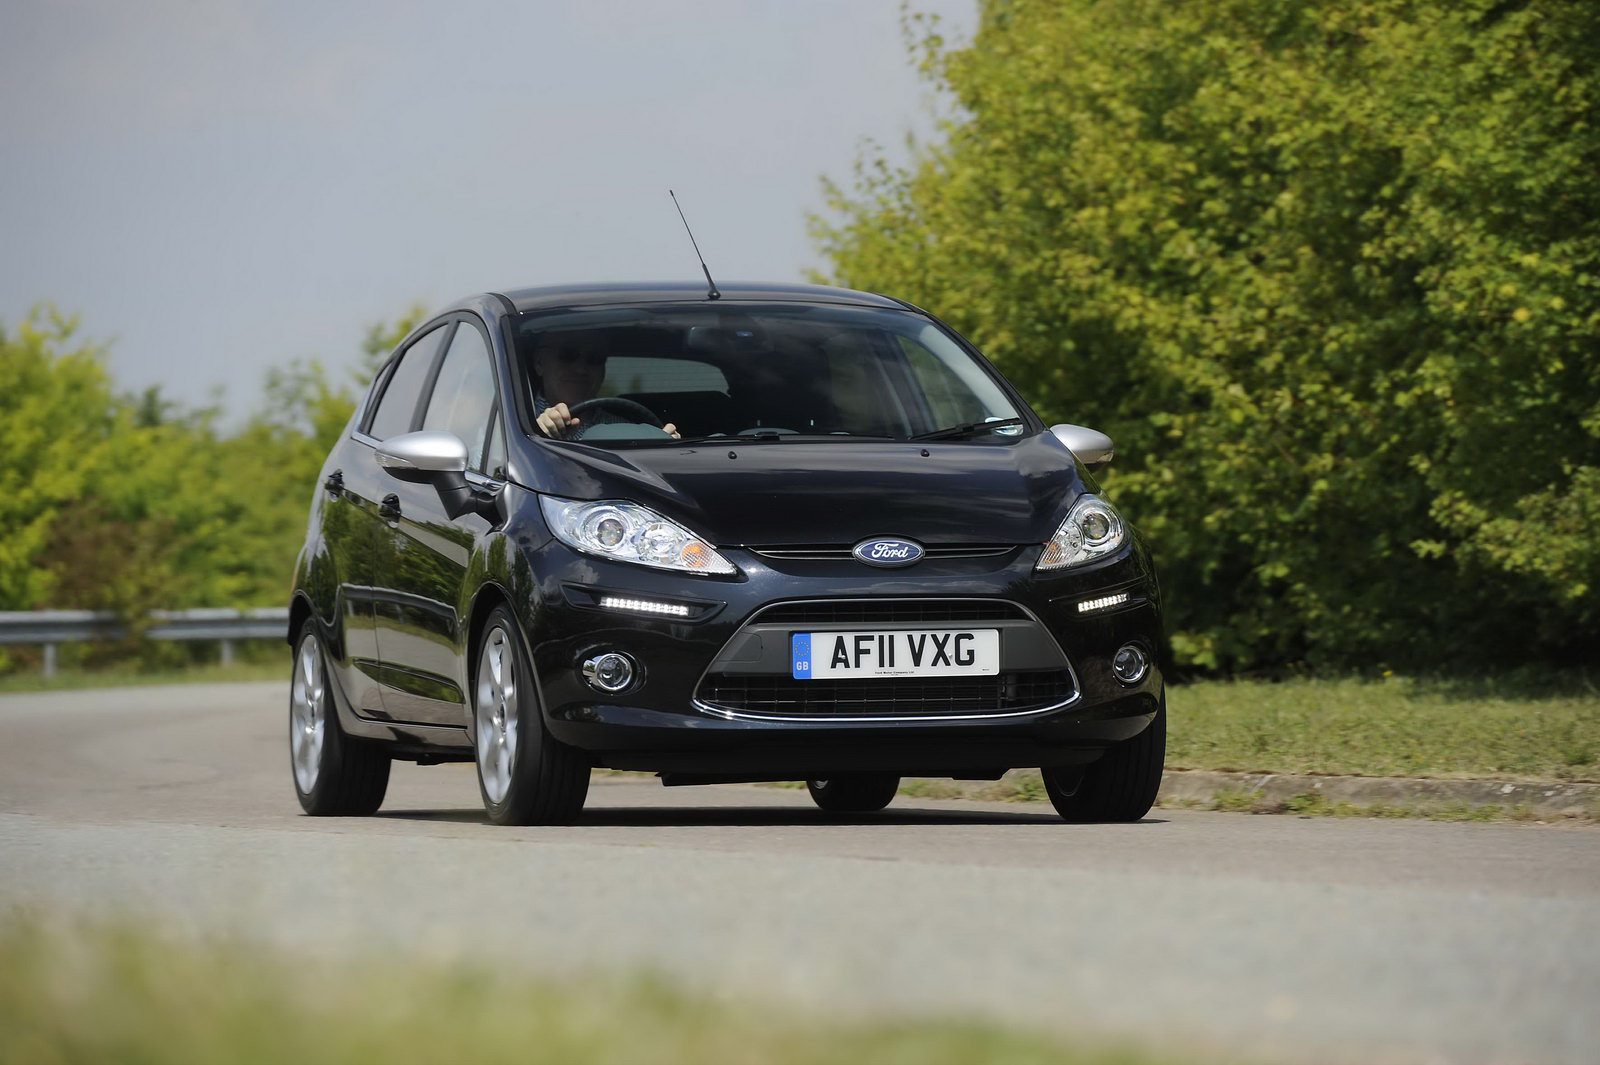 http://2.bp.blogspot.com/-7uemRpm6d4k/TkCt2BqzGSI/AAAAAAAAecU/4TDoSV9nGkI/s1600/Ford-Fiesta-Centura-1.jpg